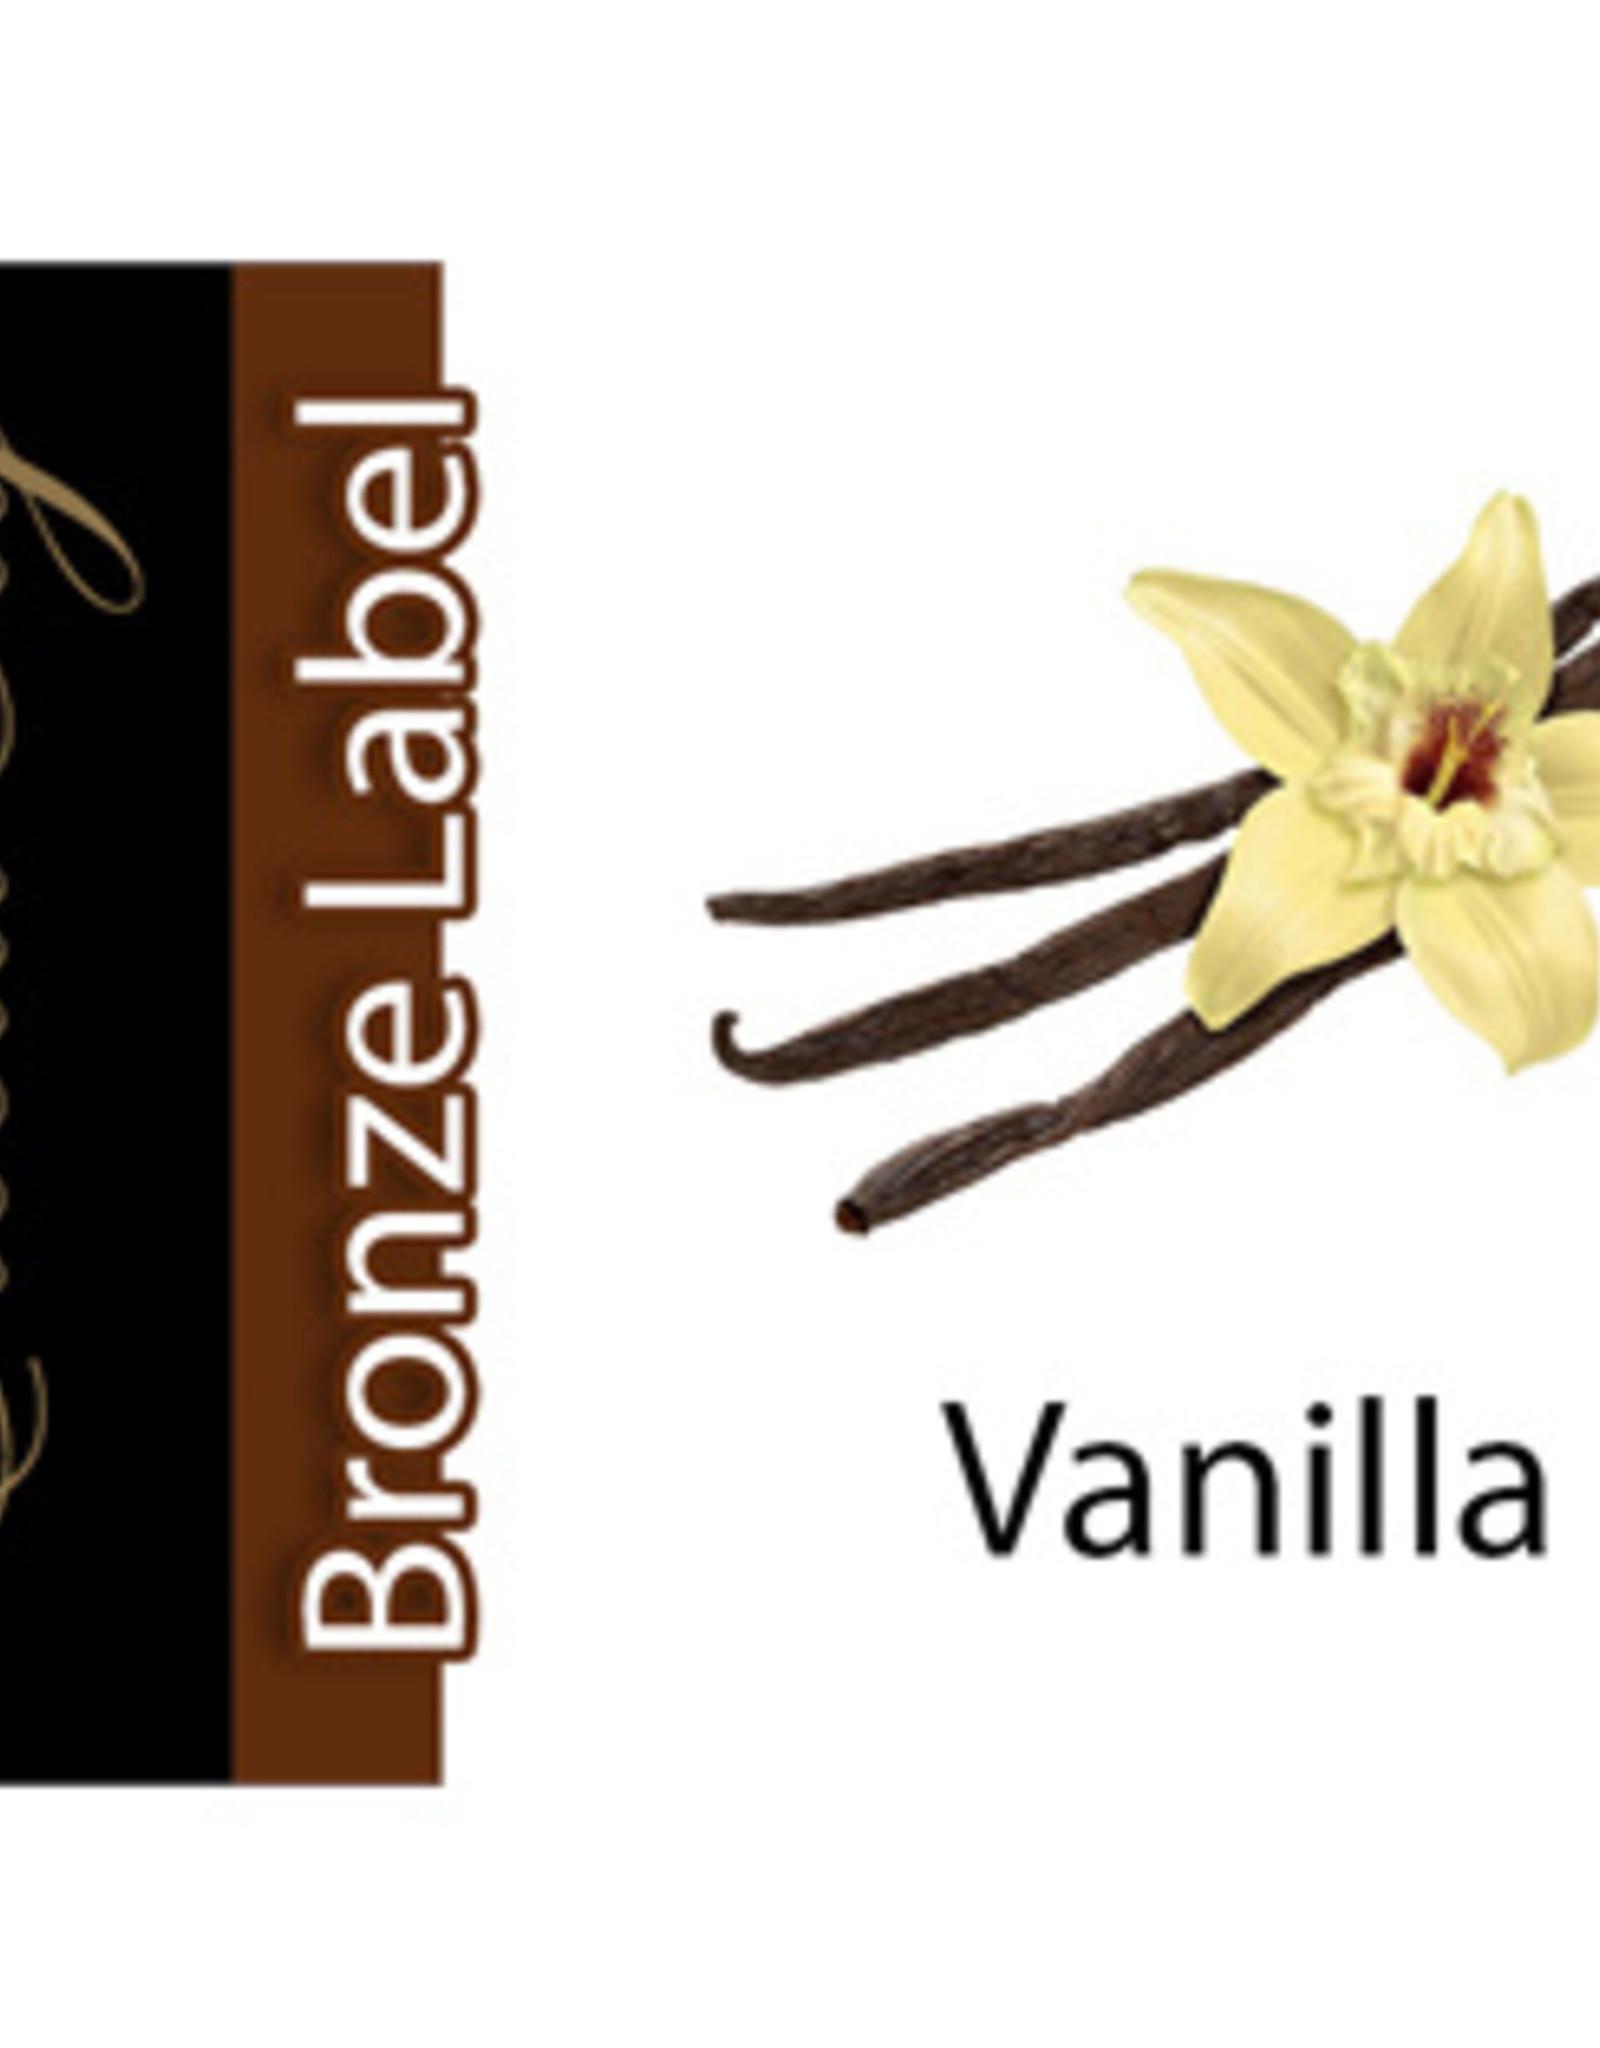 Exclucig Exclucig Bronze Label E-liquid Vanilla 12 mg Nicotine